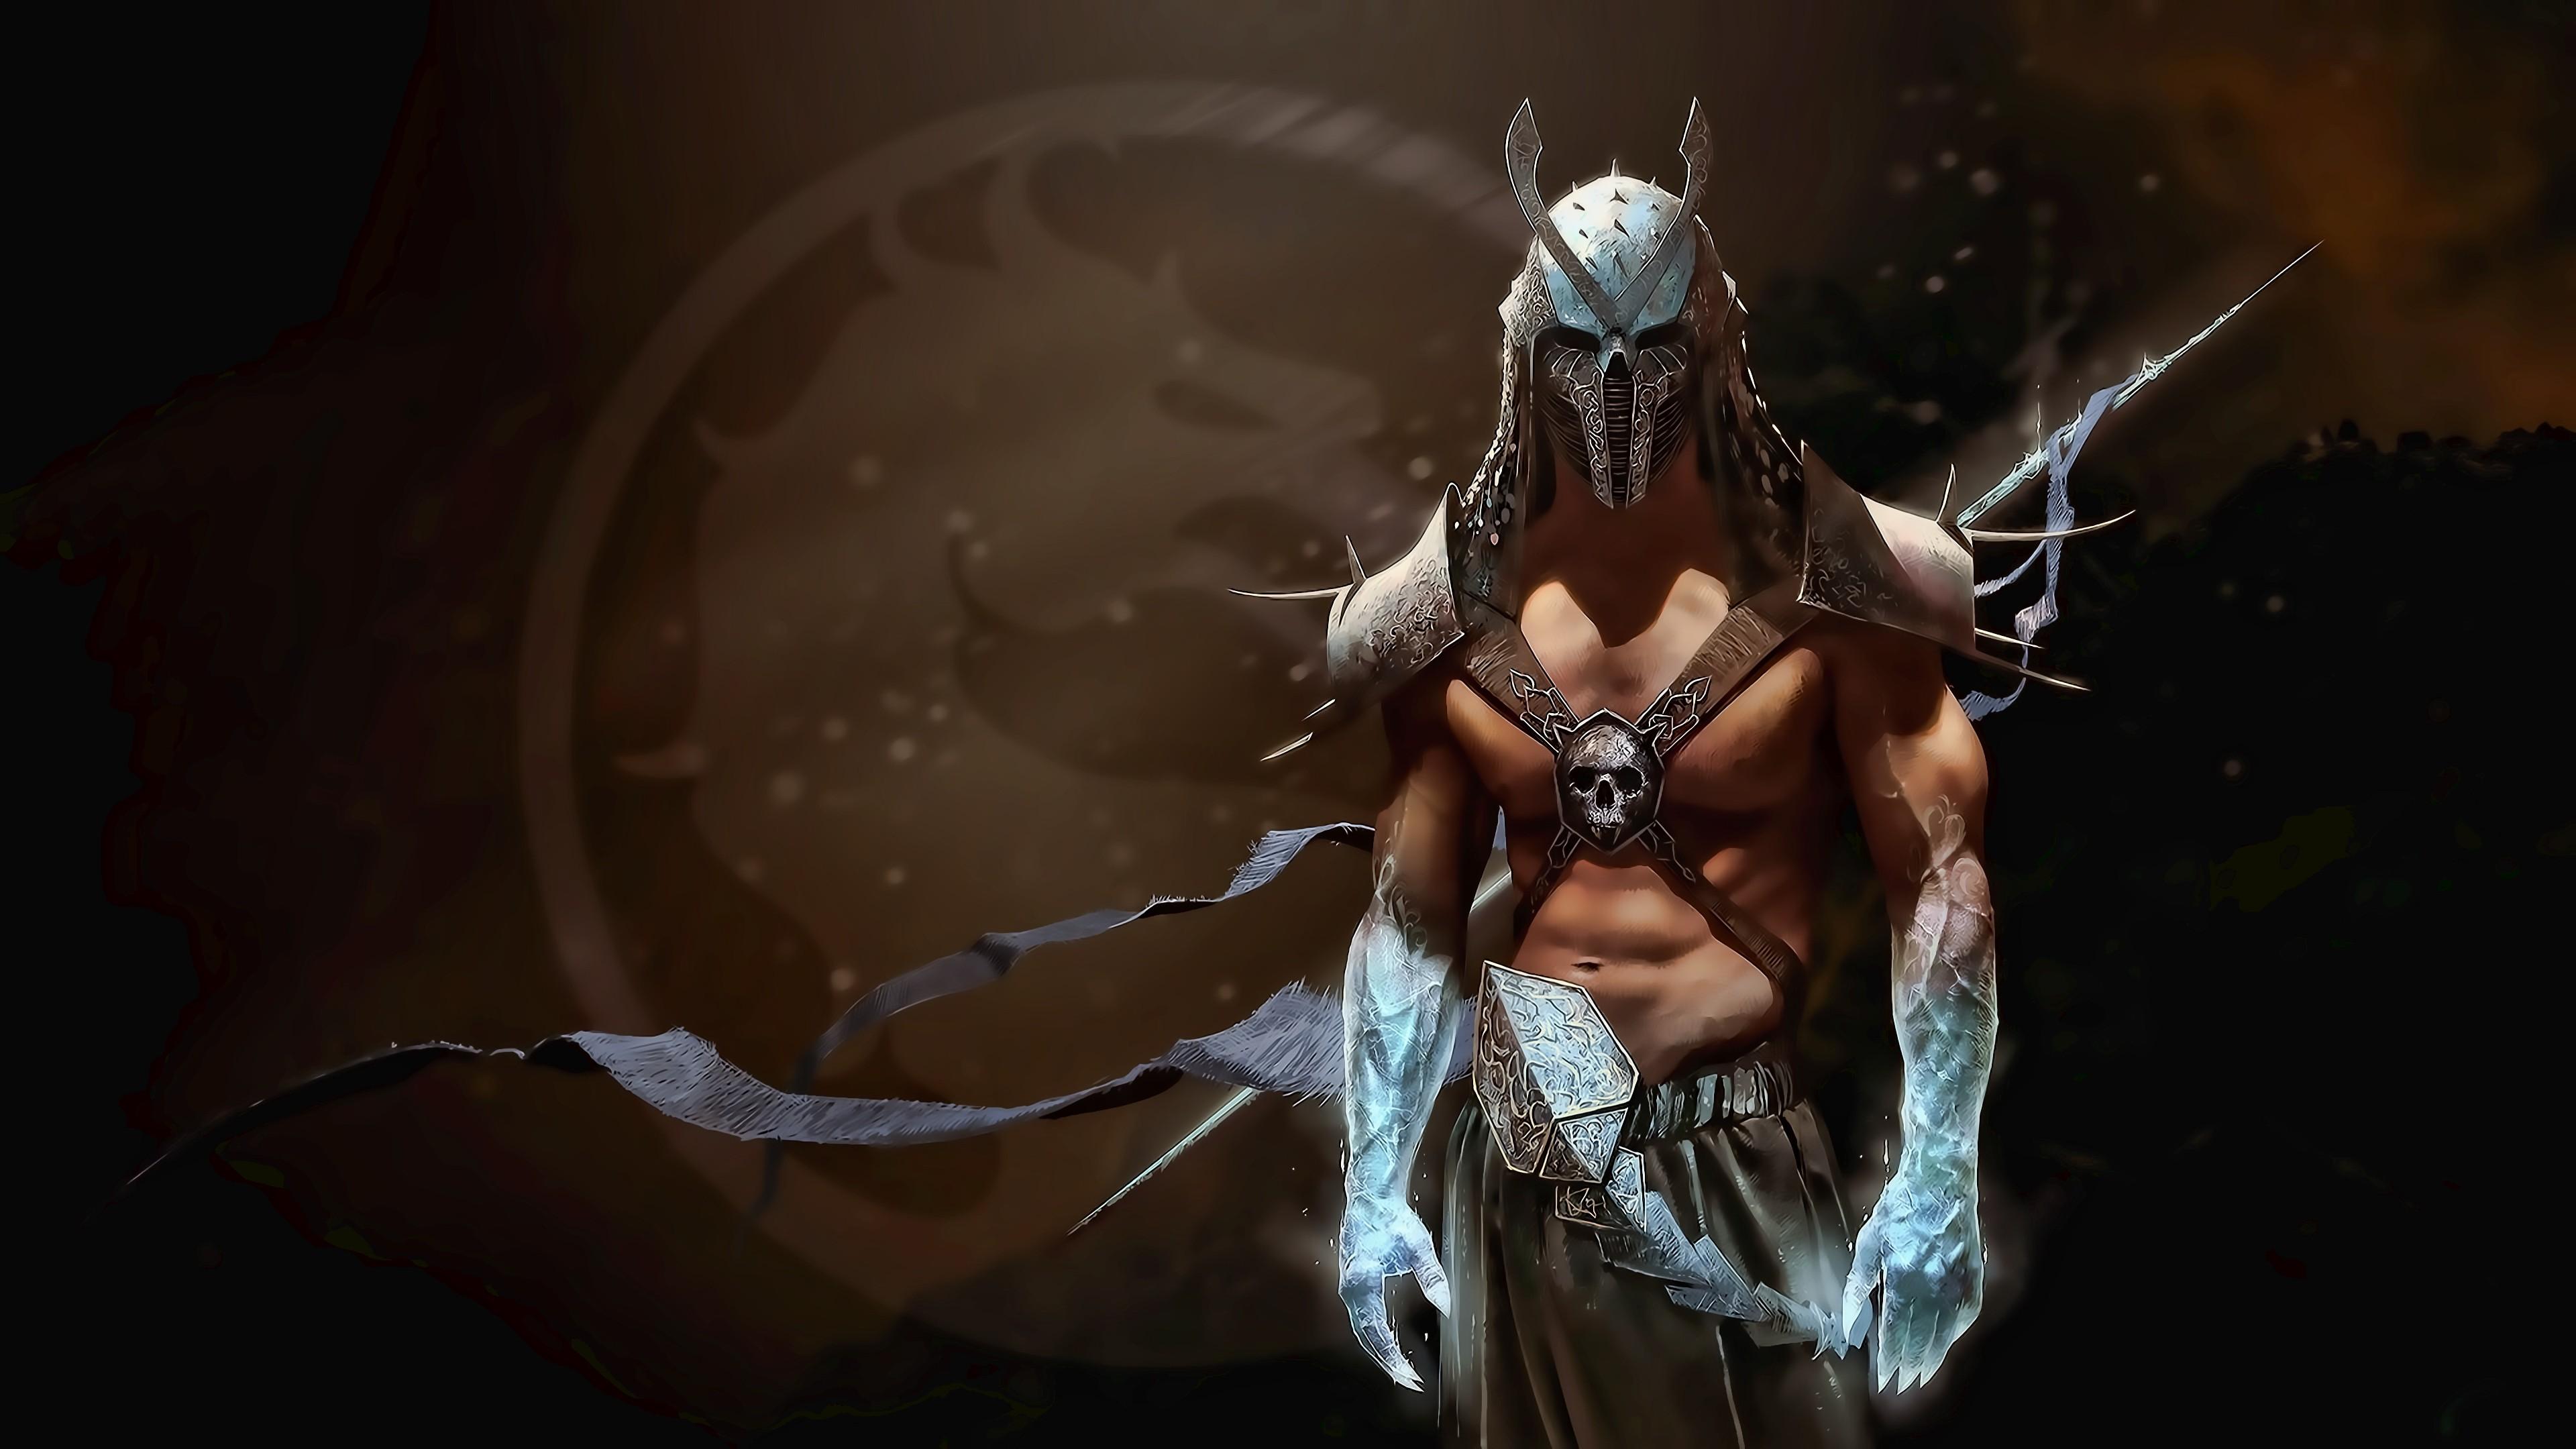 Shao Kahn Mortal Kombat, HD Games, 4k Wallpapers, Images